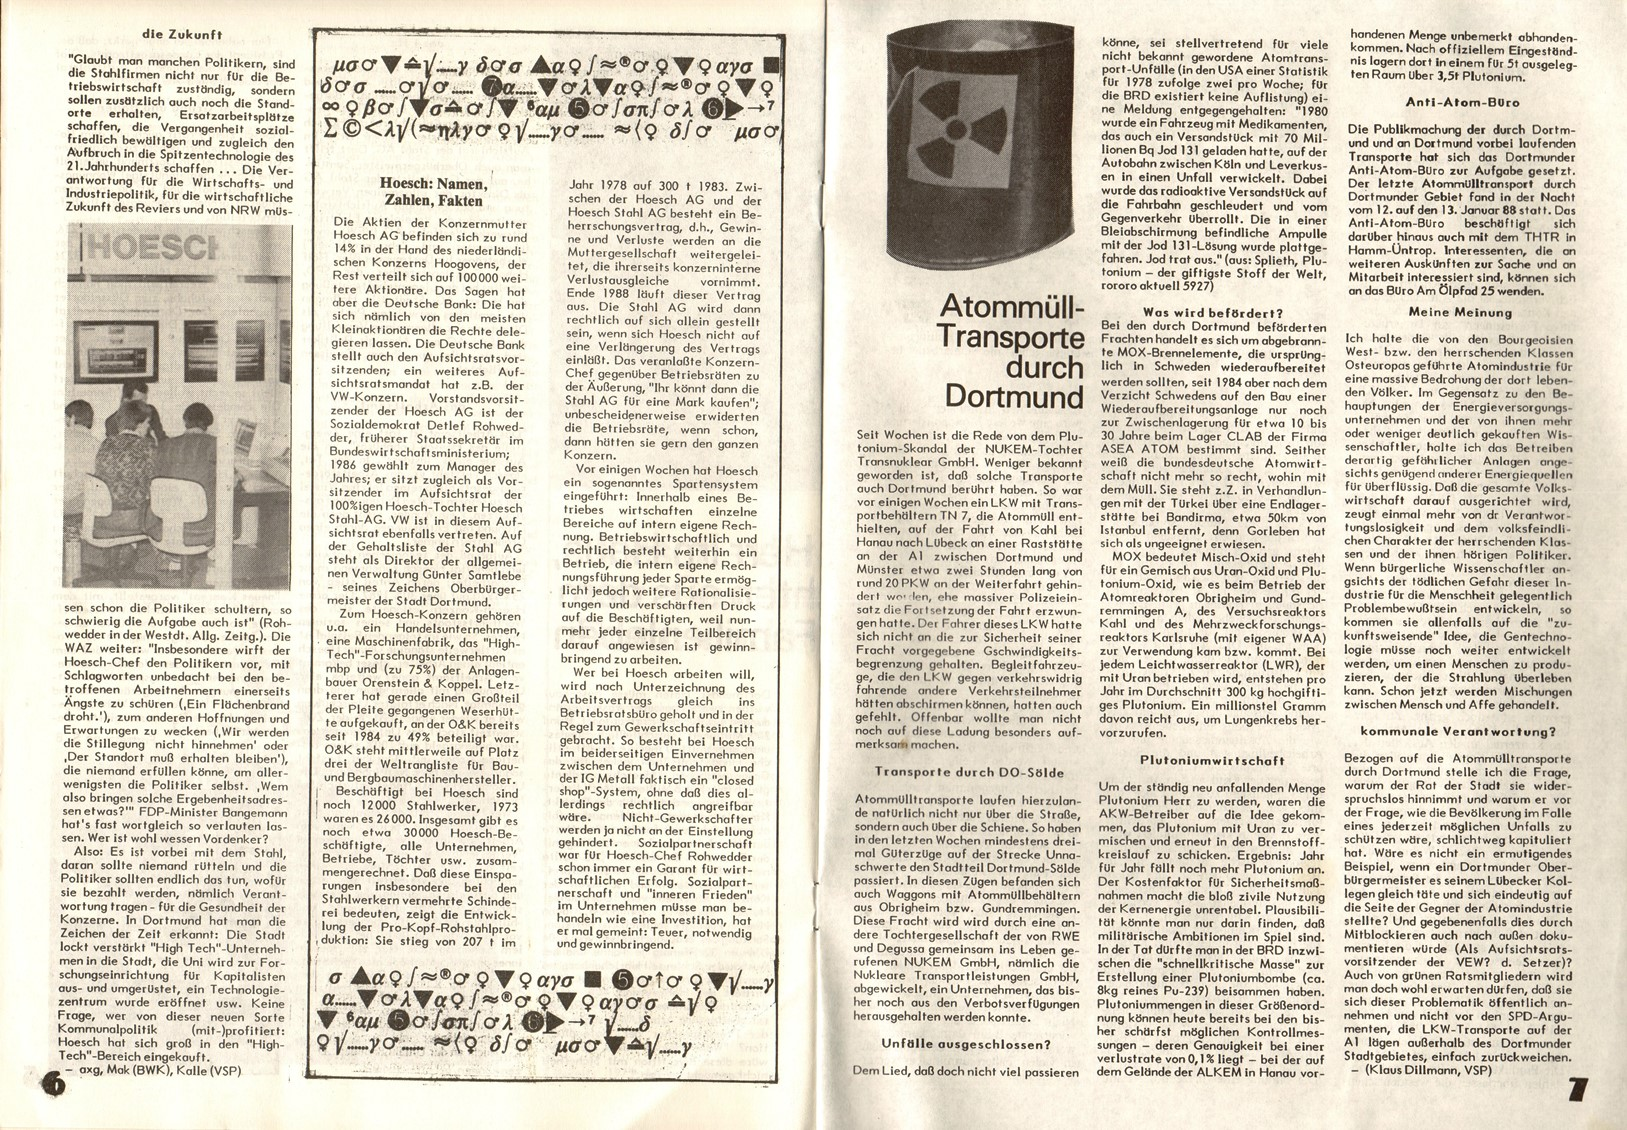 Dortmund_Pottkieker_19880200_04